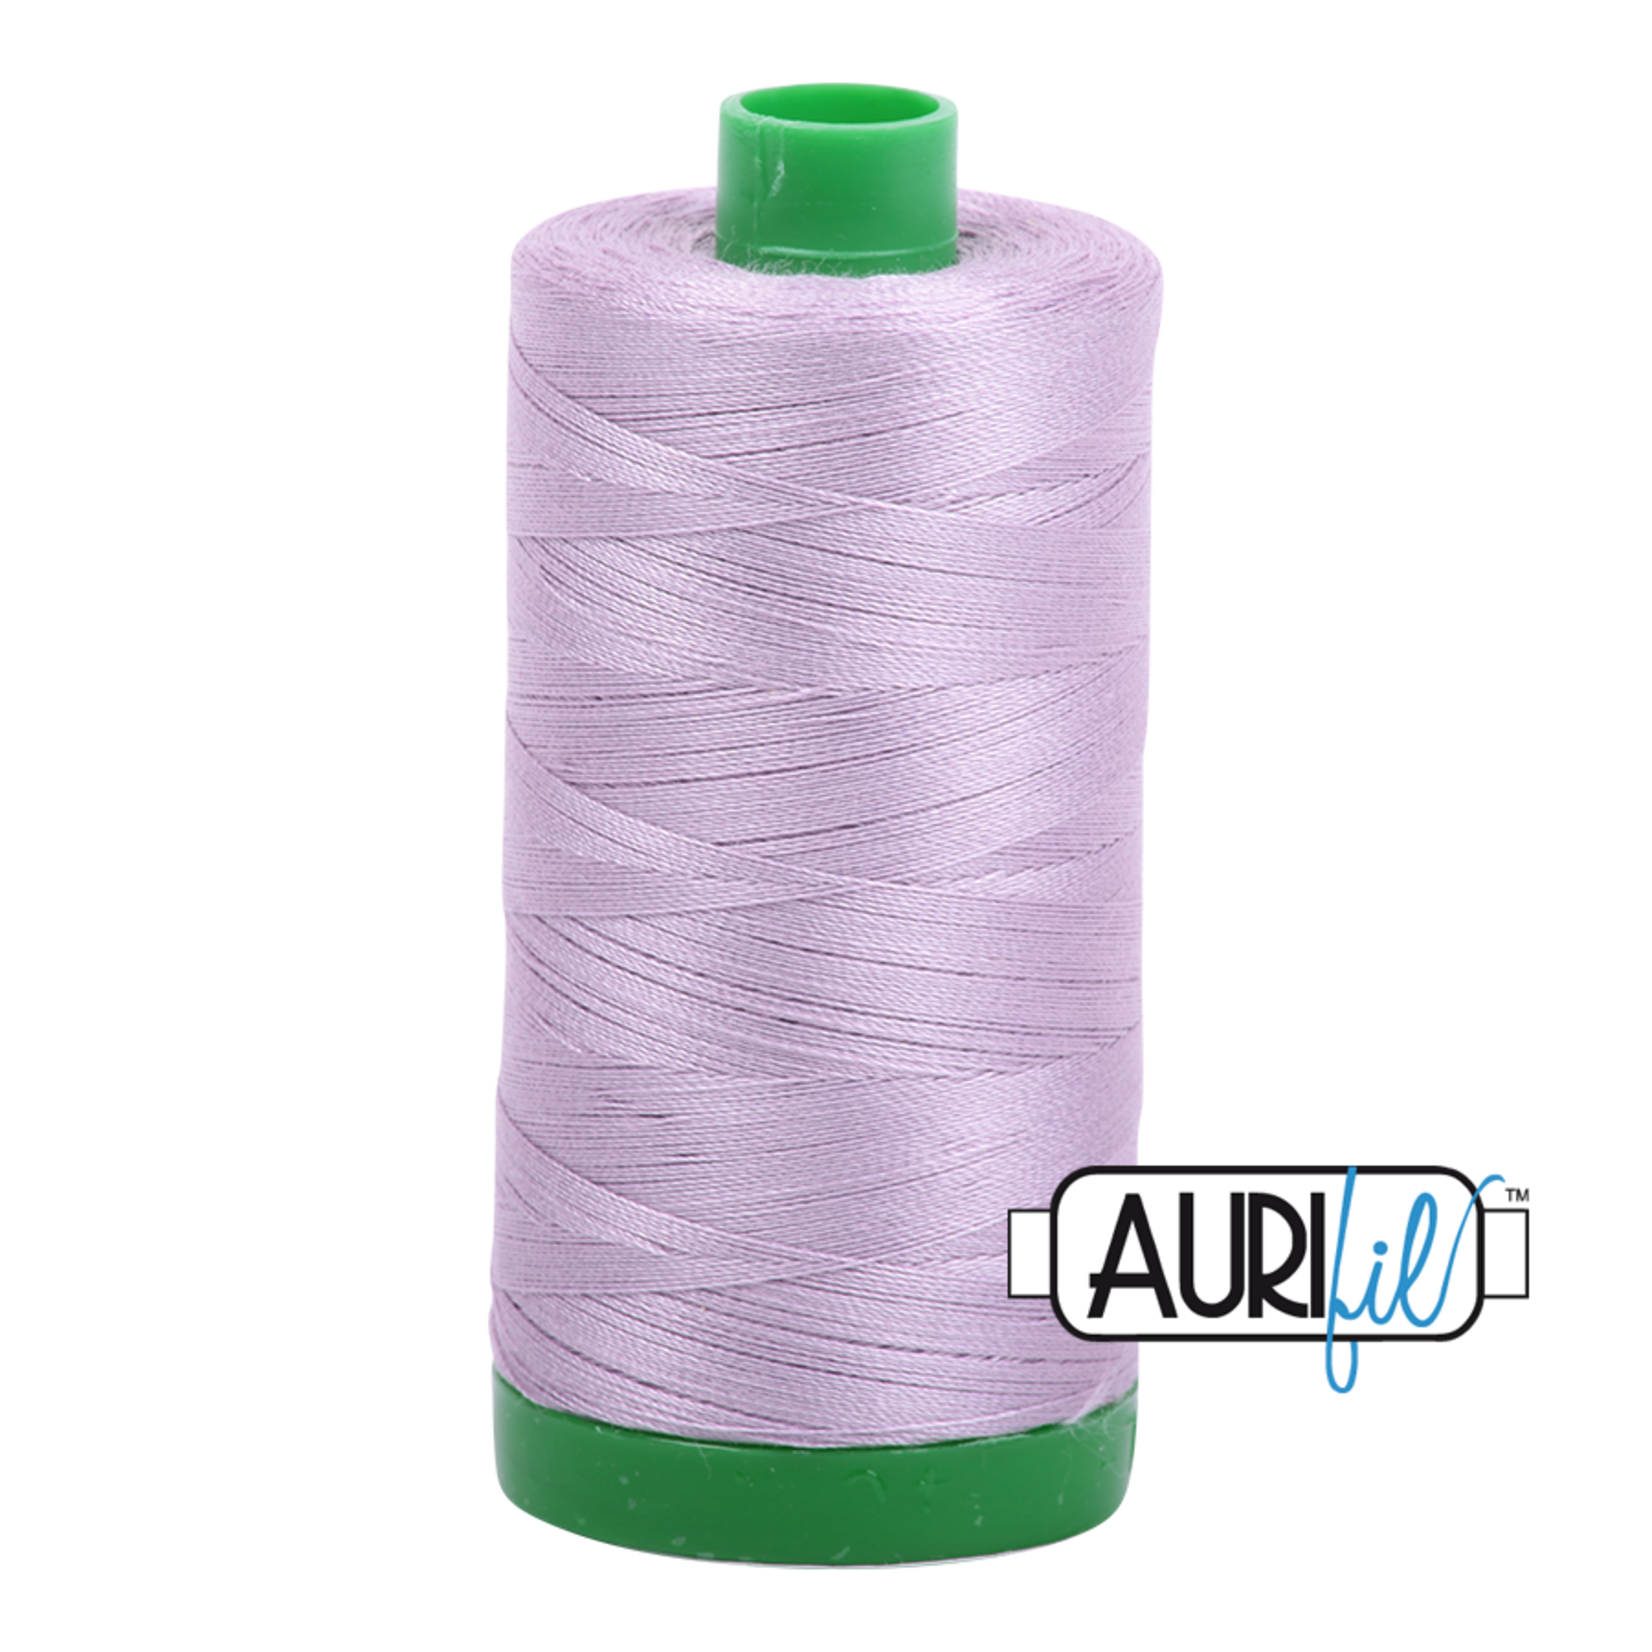 AURIFIL AURIFIL 40 WT Lilac 2562